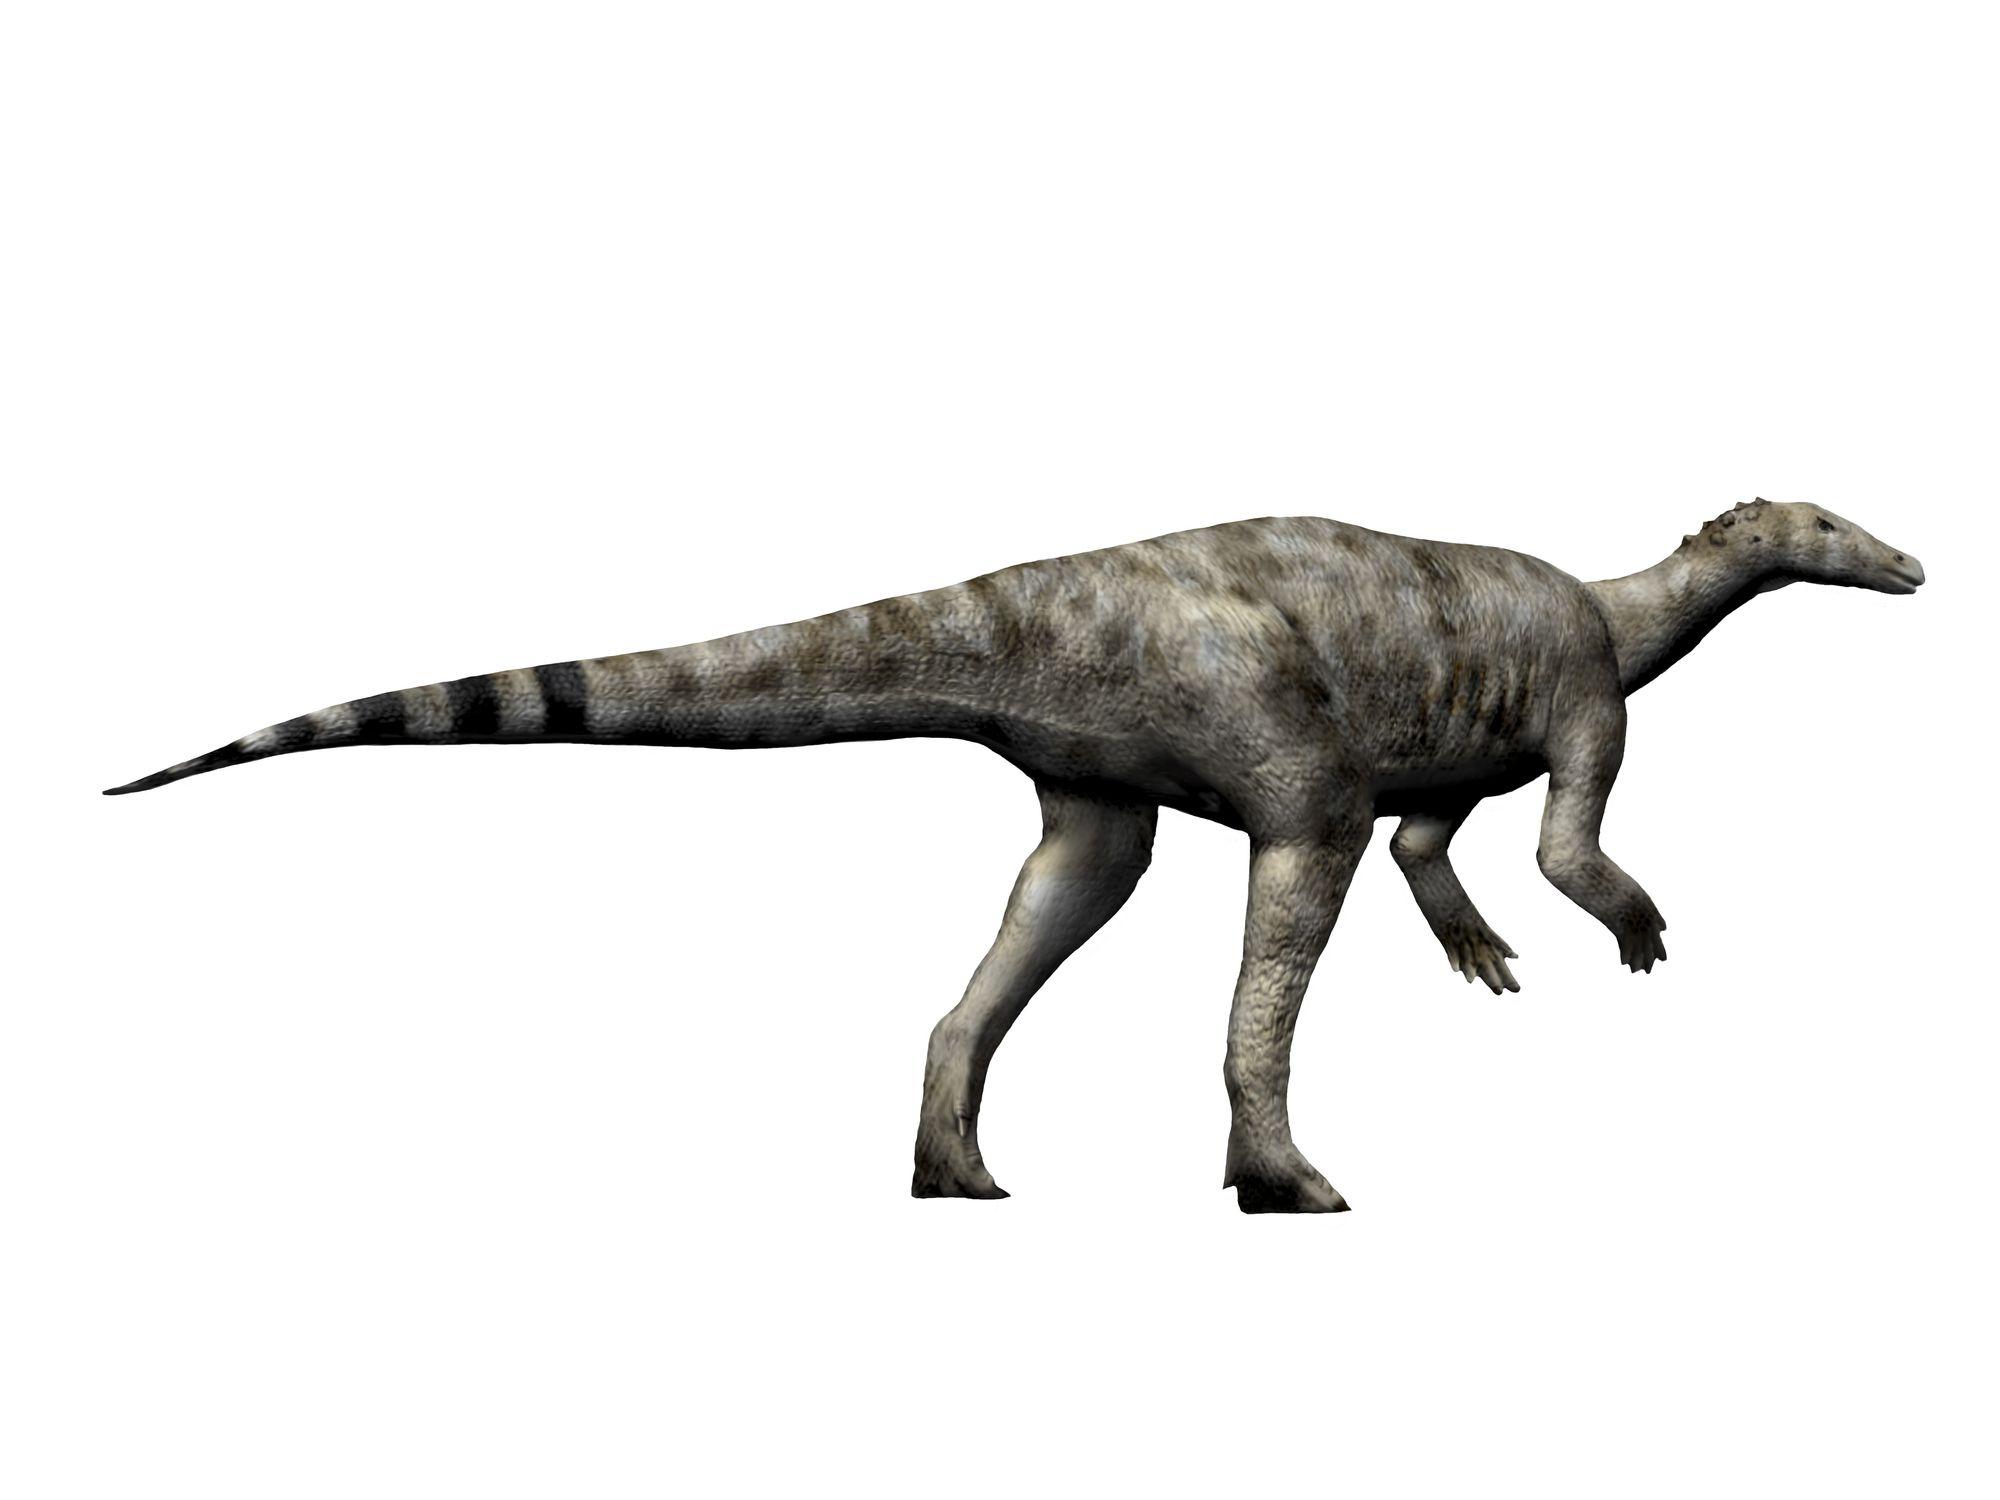 Thescelosaurus dinosaur, white background.